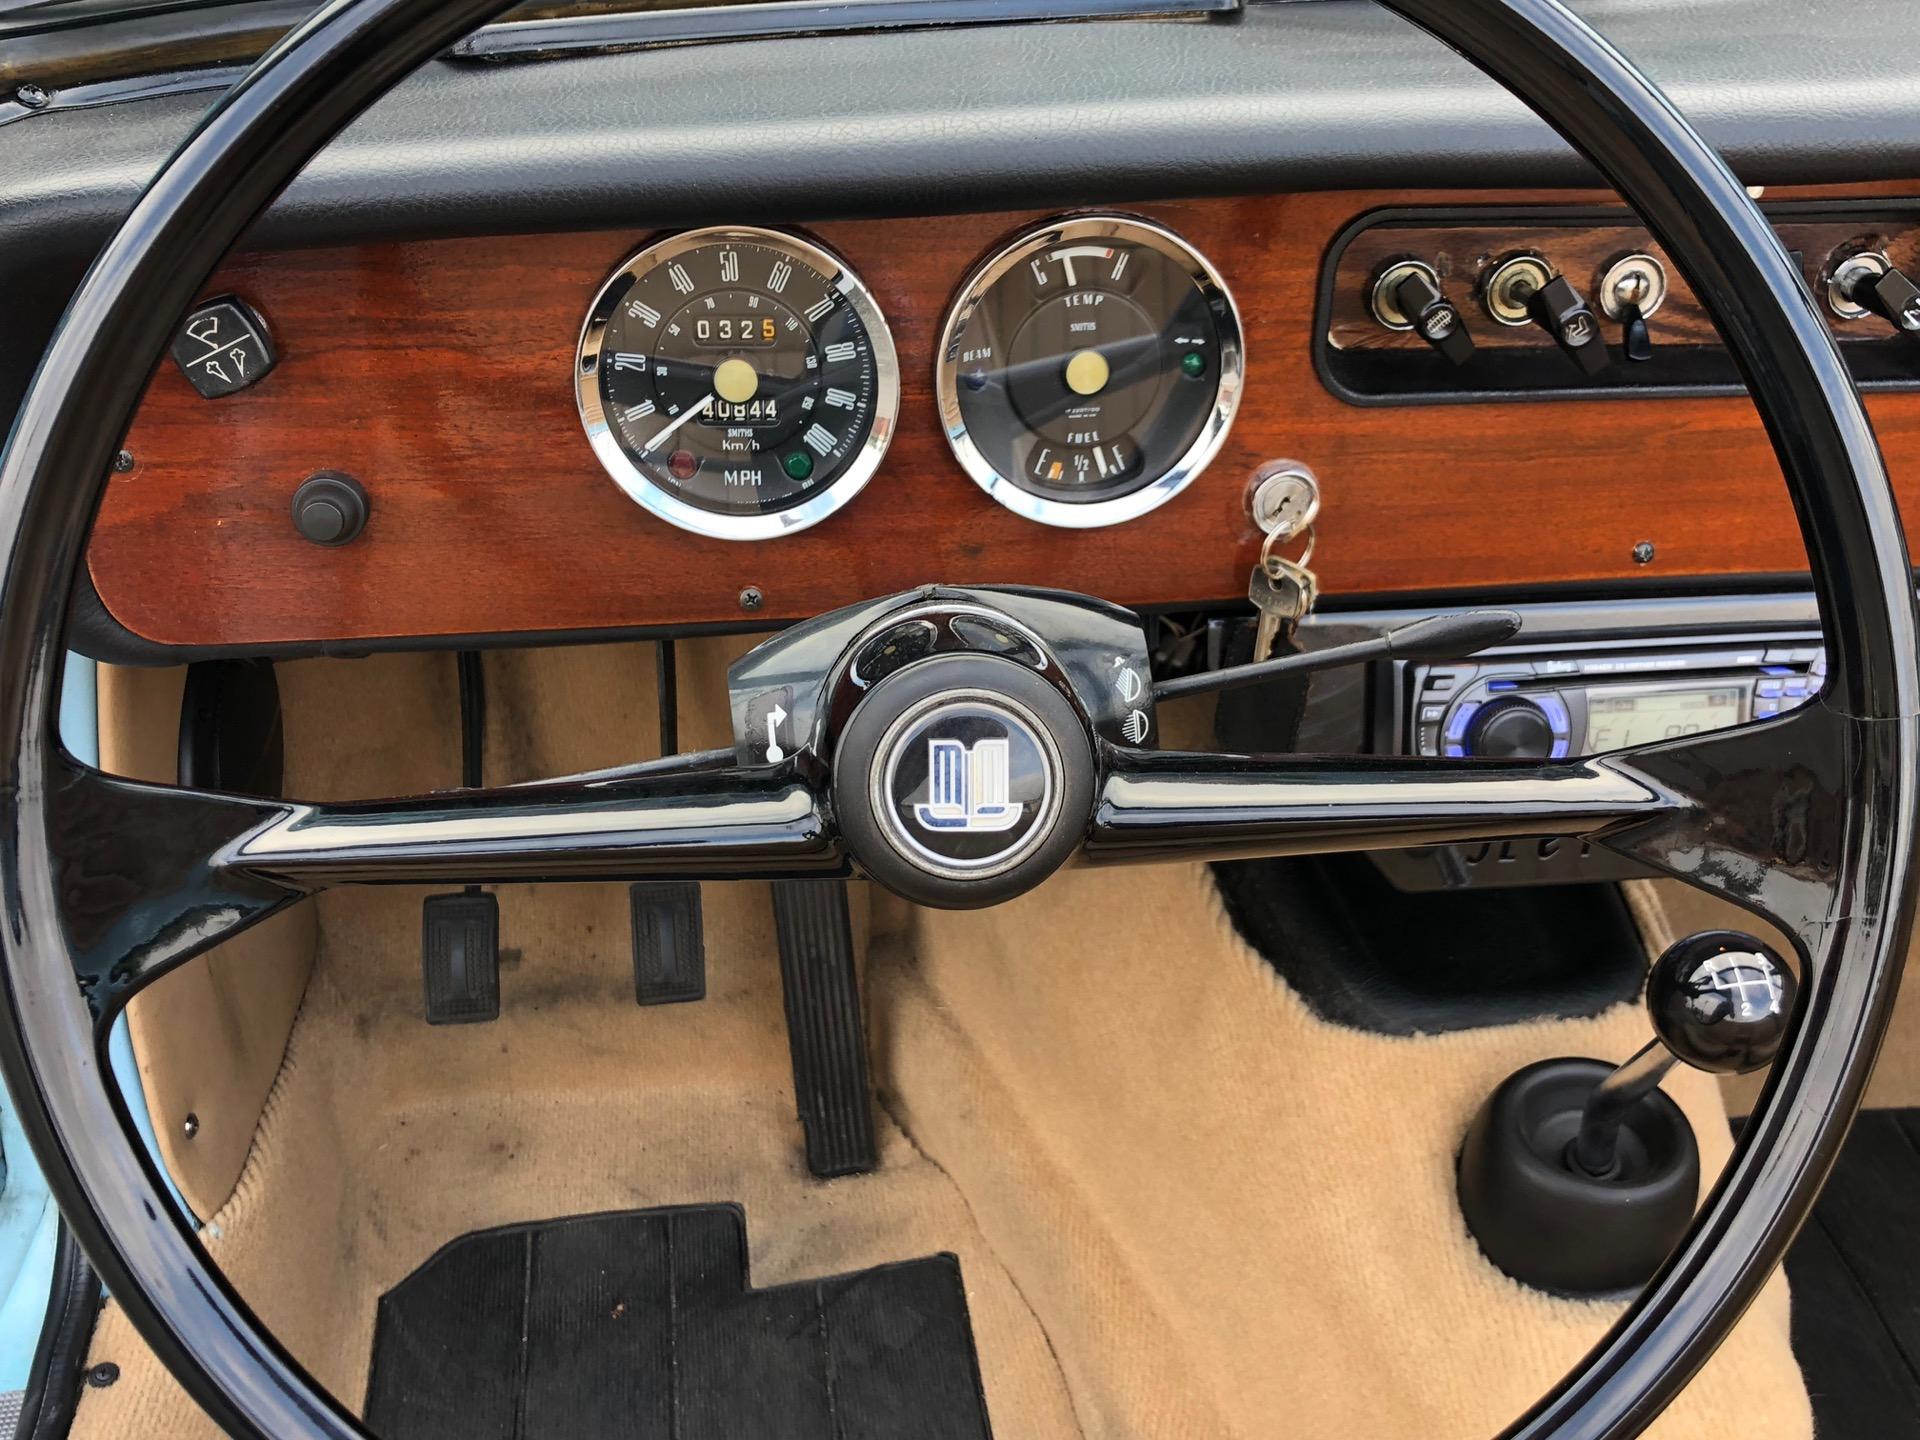 Used-1968-Triumph-Herald-13/60